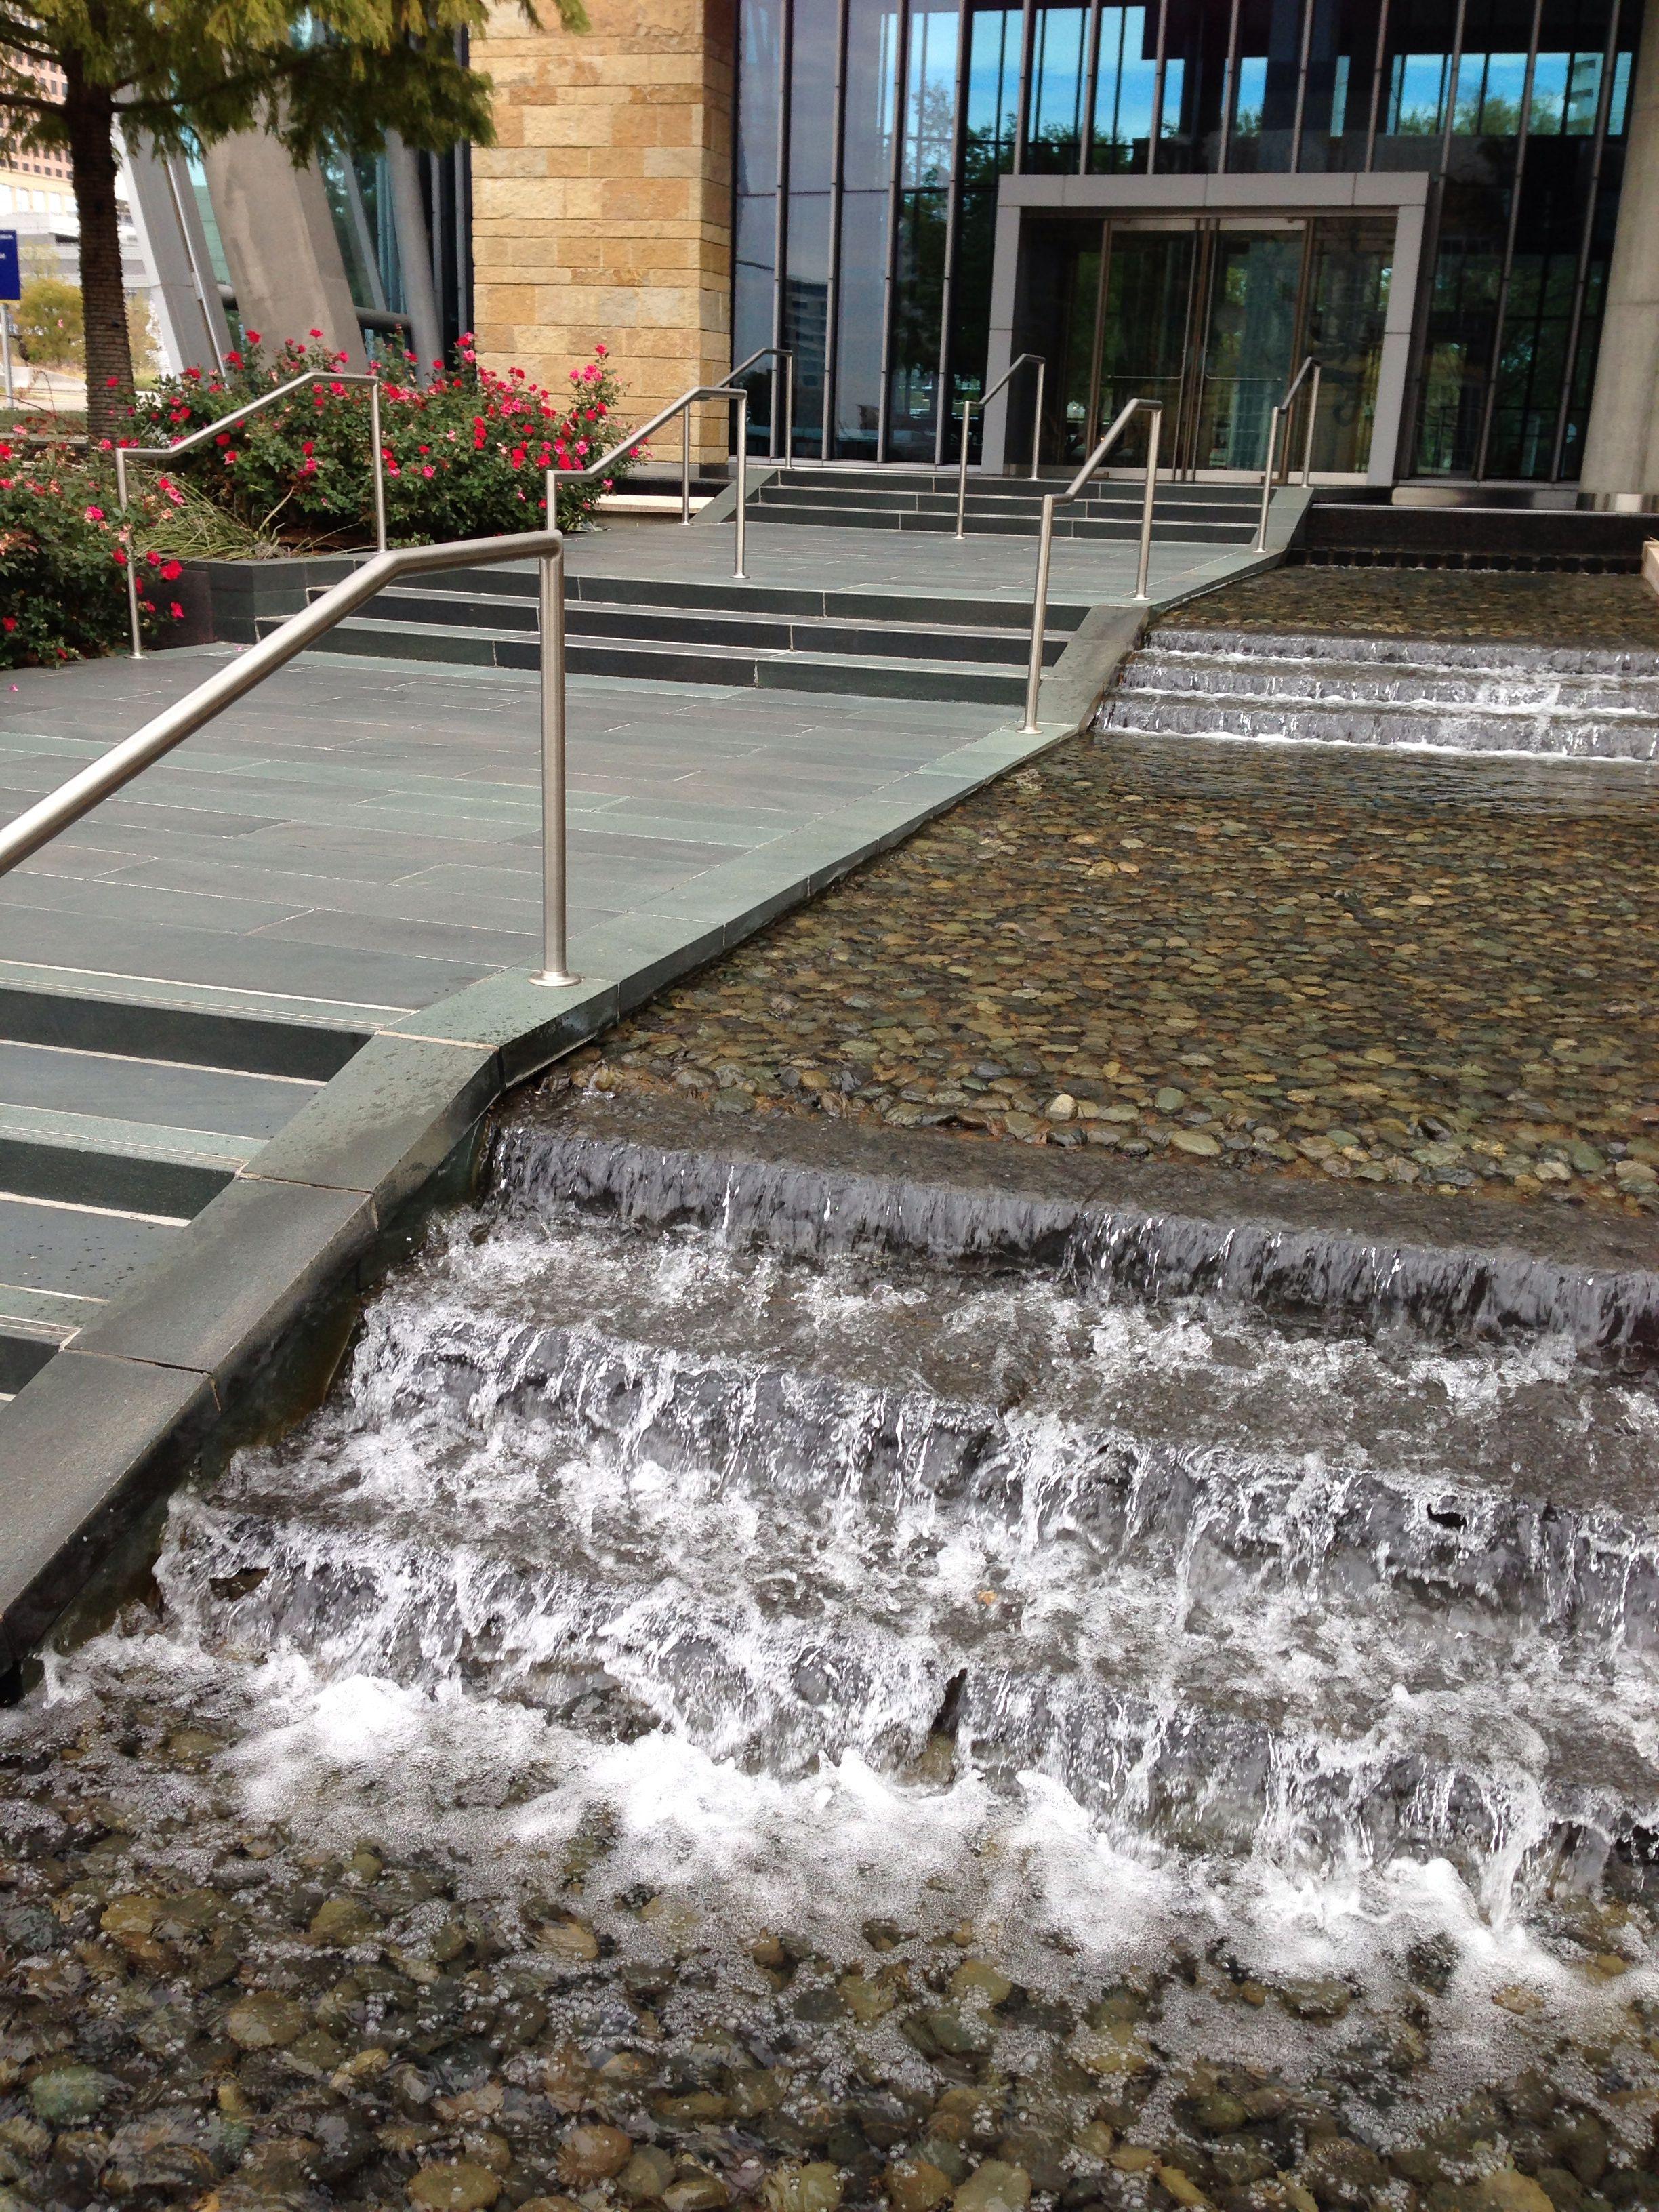 Dallas Water Company >> Hunt Oil Company Fountain Dallas Texas Designed By The Beck Group